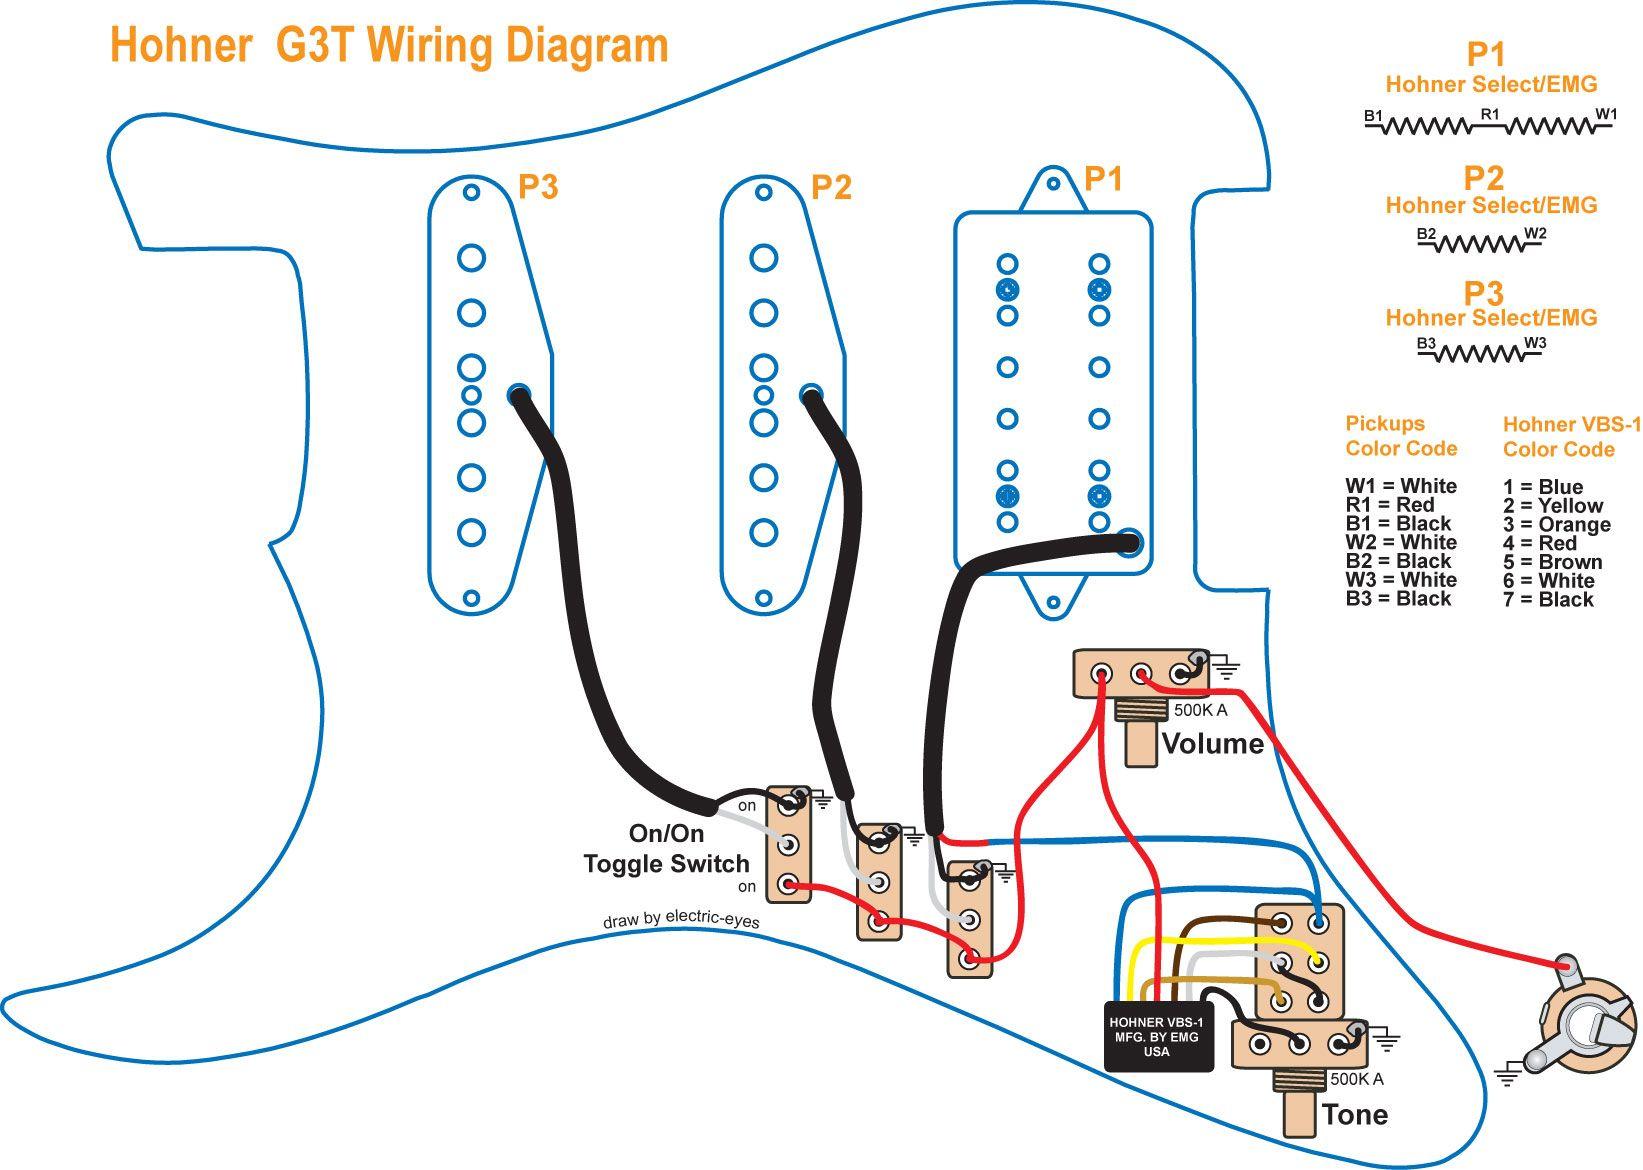 Amazing Lifan 125cc Engine Wiring Tall Hss Strat Wiring Solid Hss Wiring Guitar 5 Way Switch Wiring Old 5 Way Switch Guitar BlueWiring A Guitar Guitar Pickup Wiring Diagram   Efcaviation